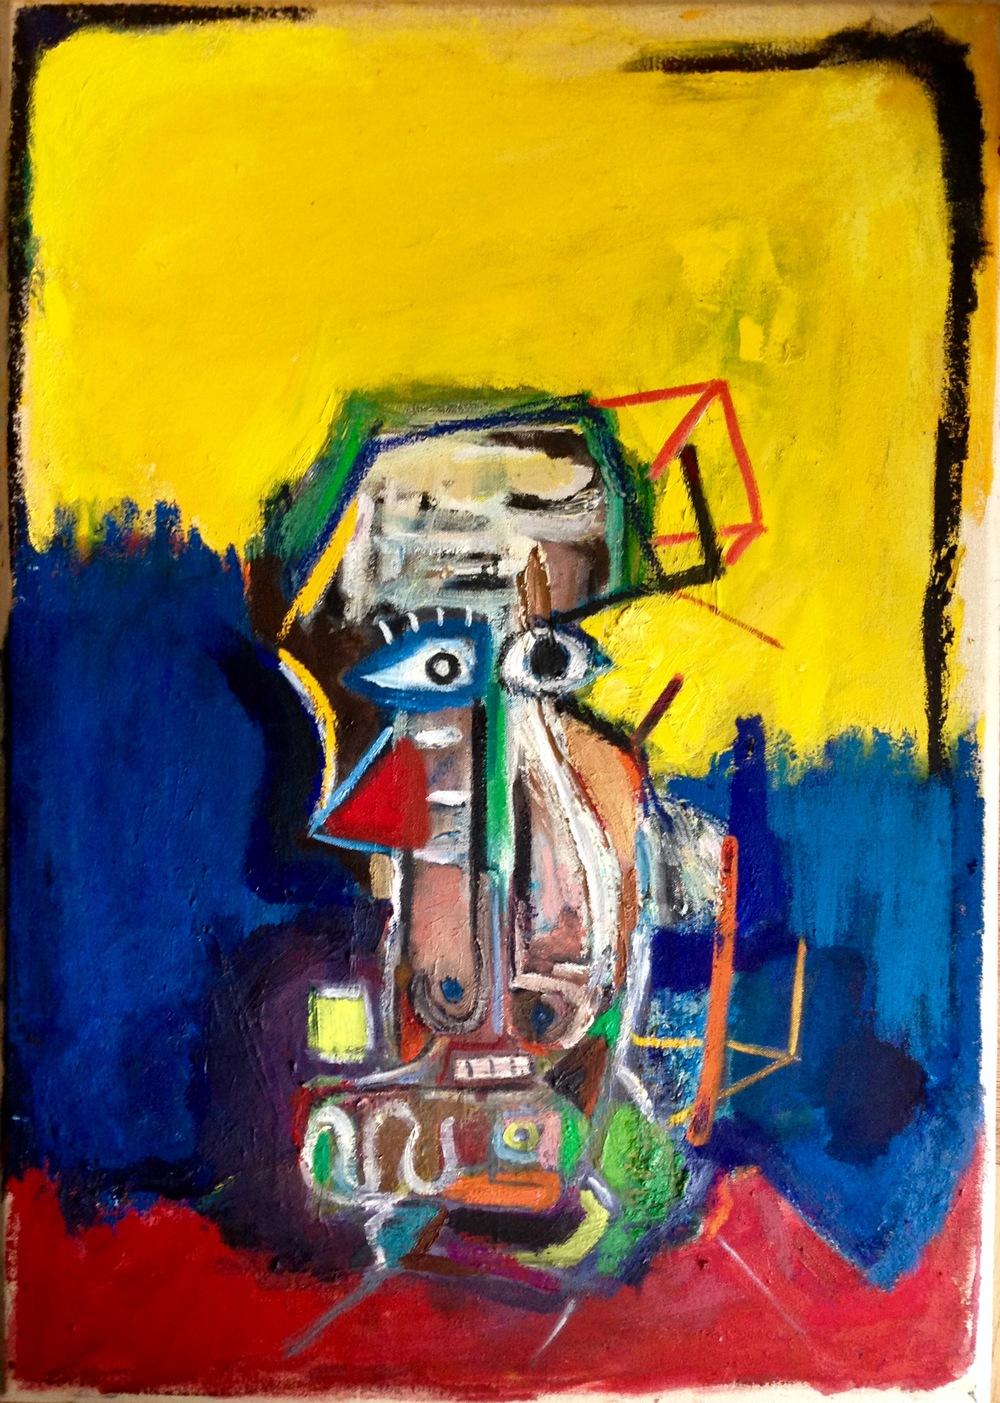 34x24 Oil on canvas